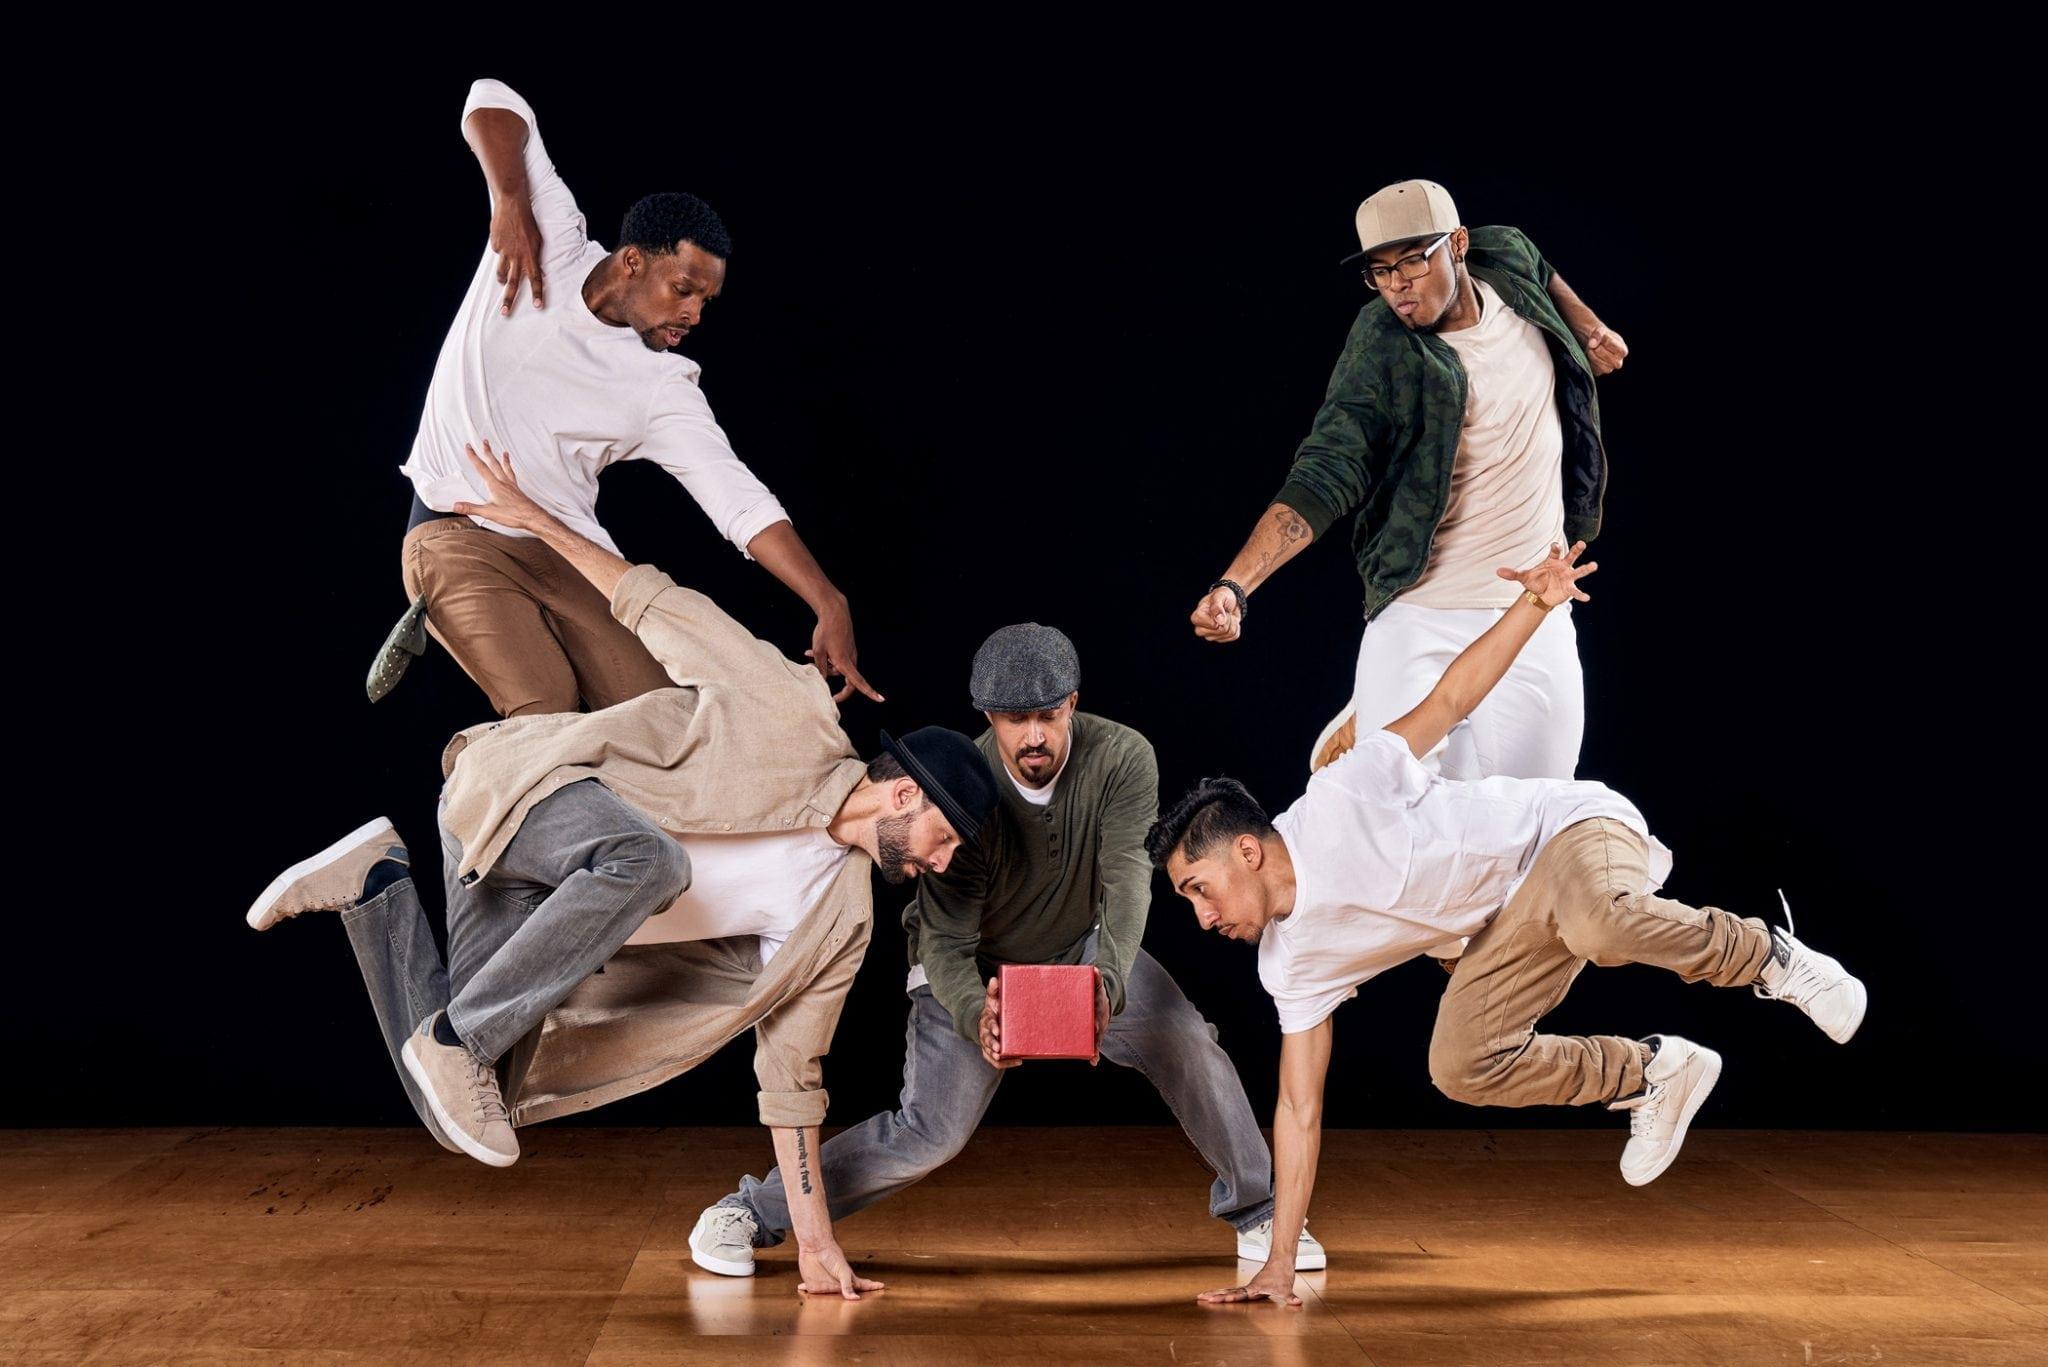 Versa-Style Dance Company: Box of Hope